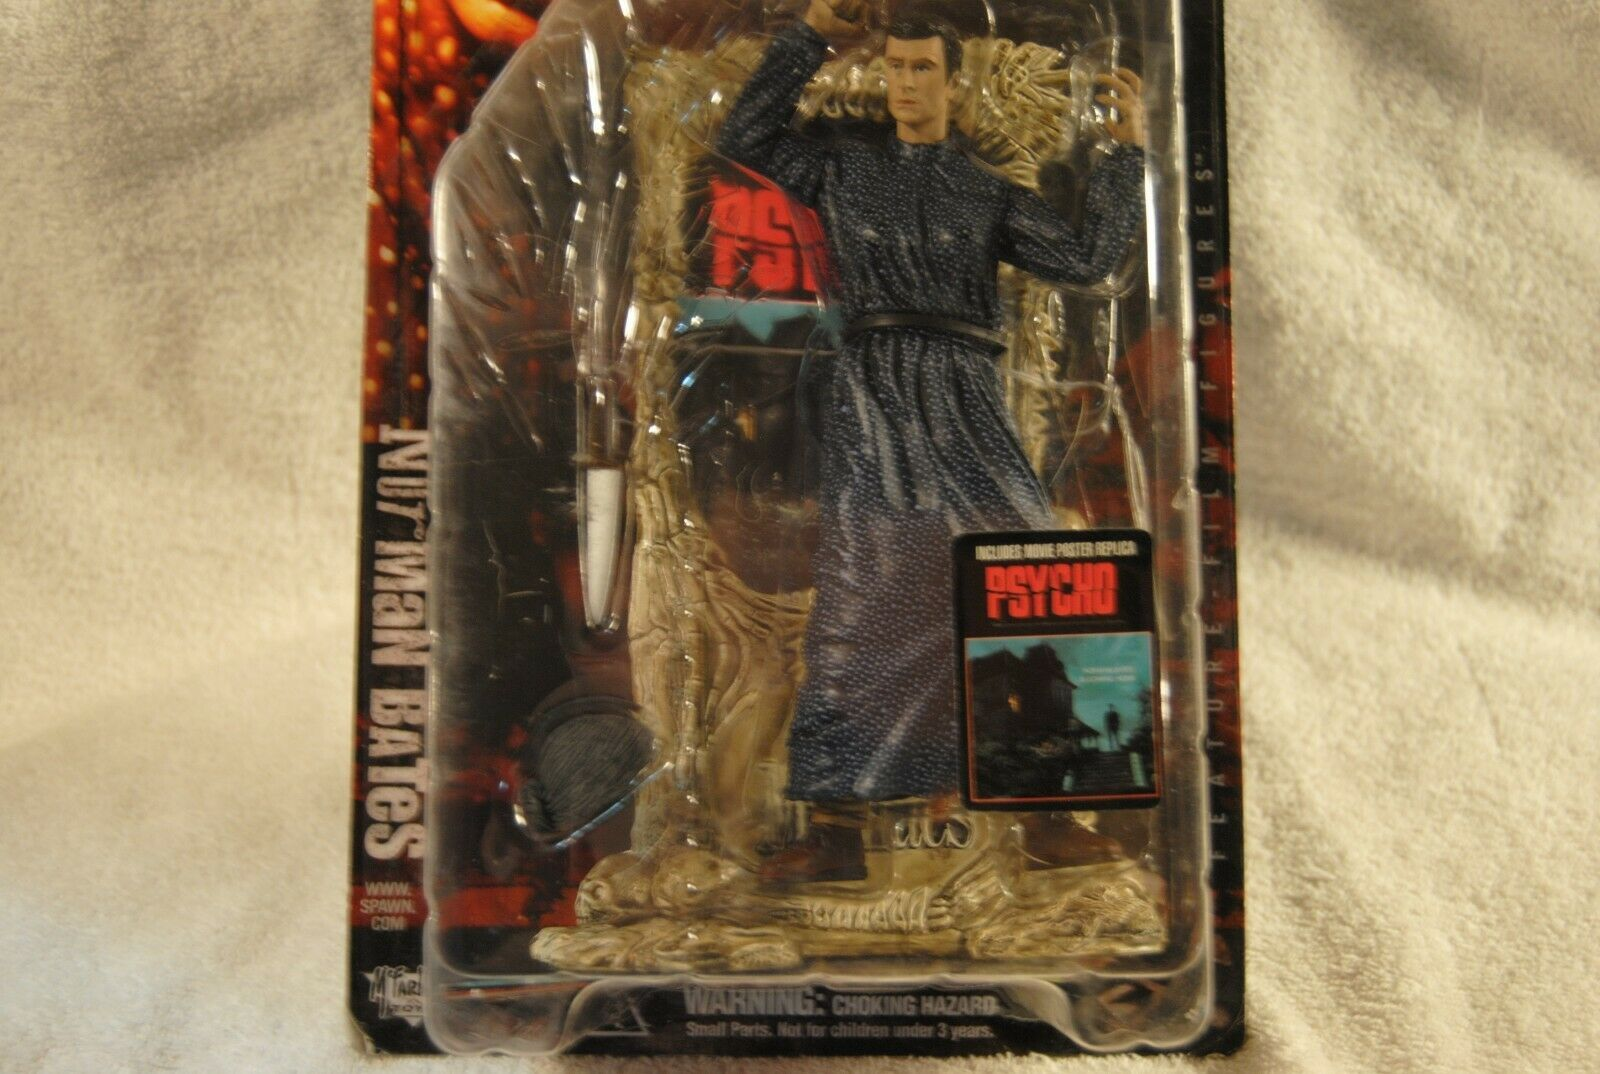 NORMAN BATES Psycho McFarlane Action Figure 1999 Movie Maniacs 2 SEALED